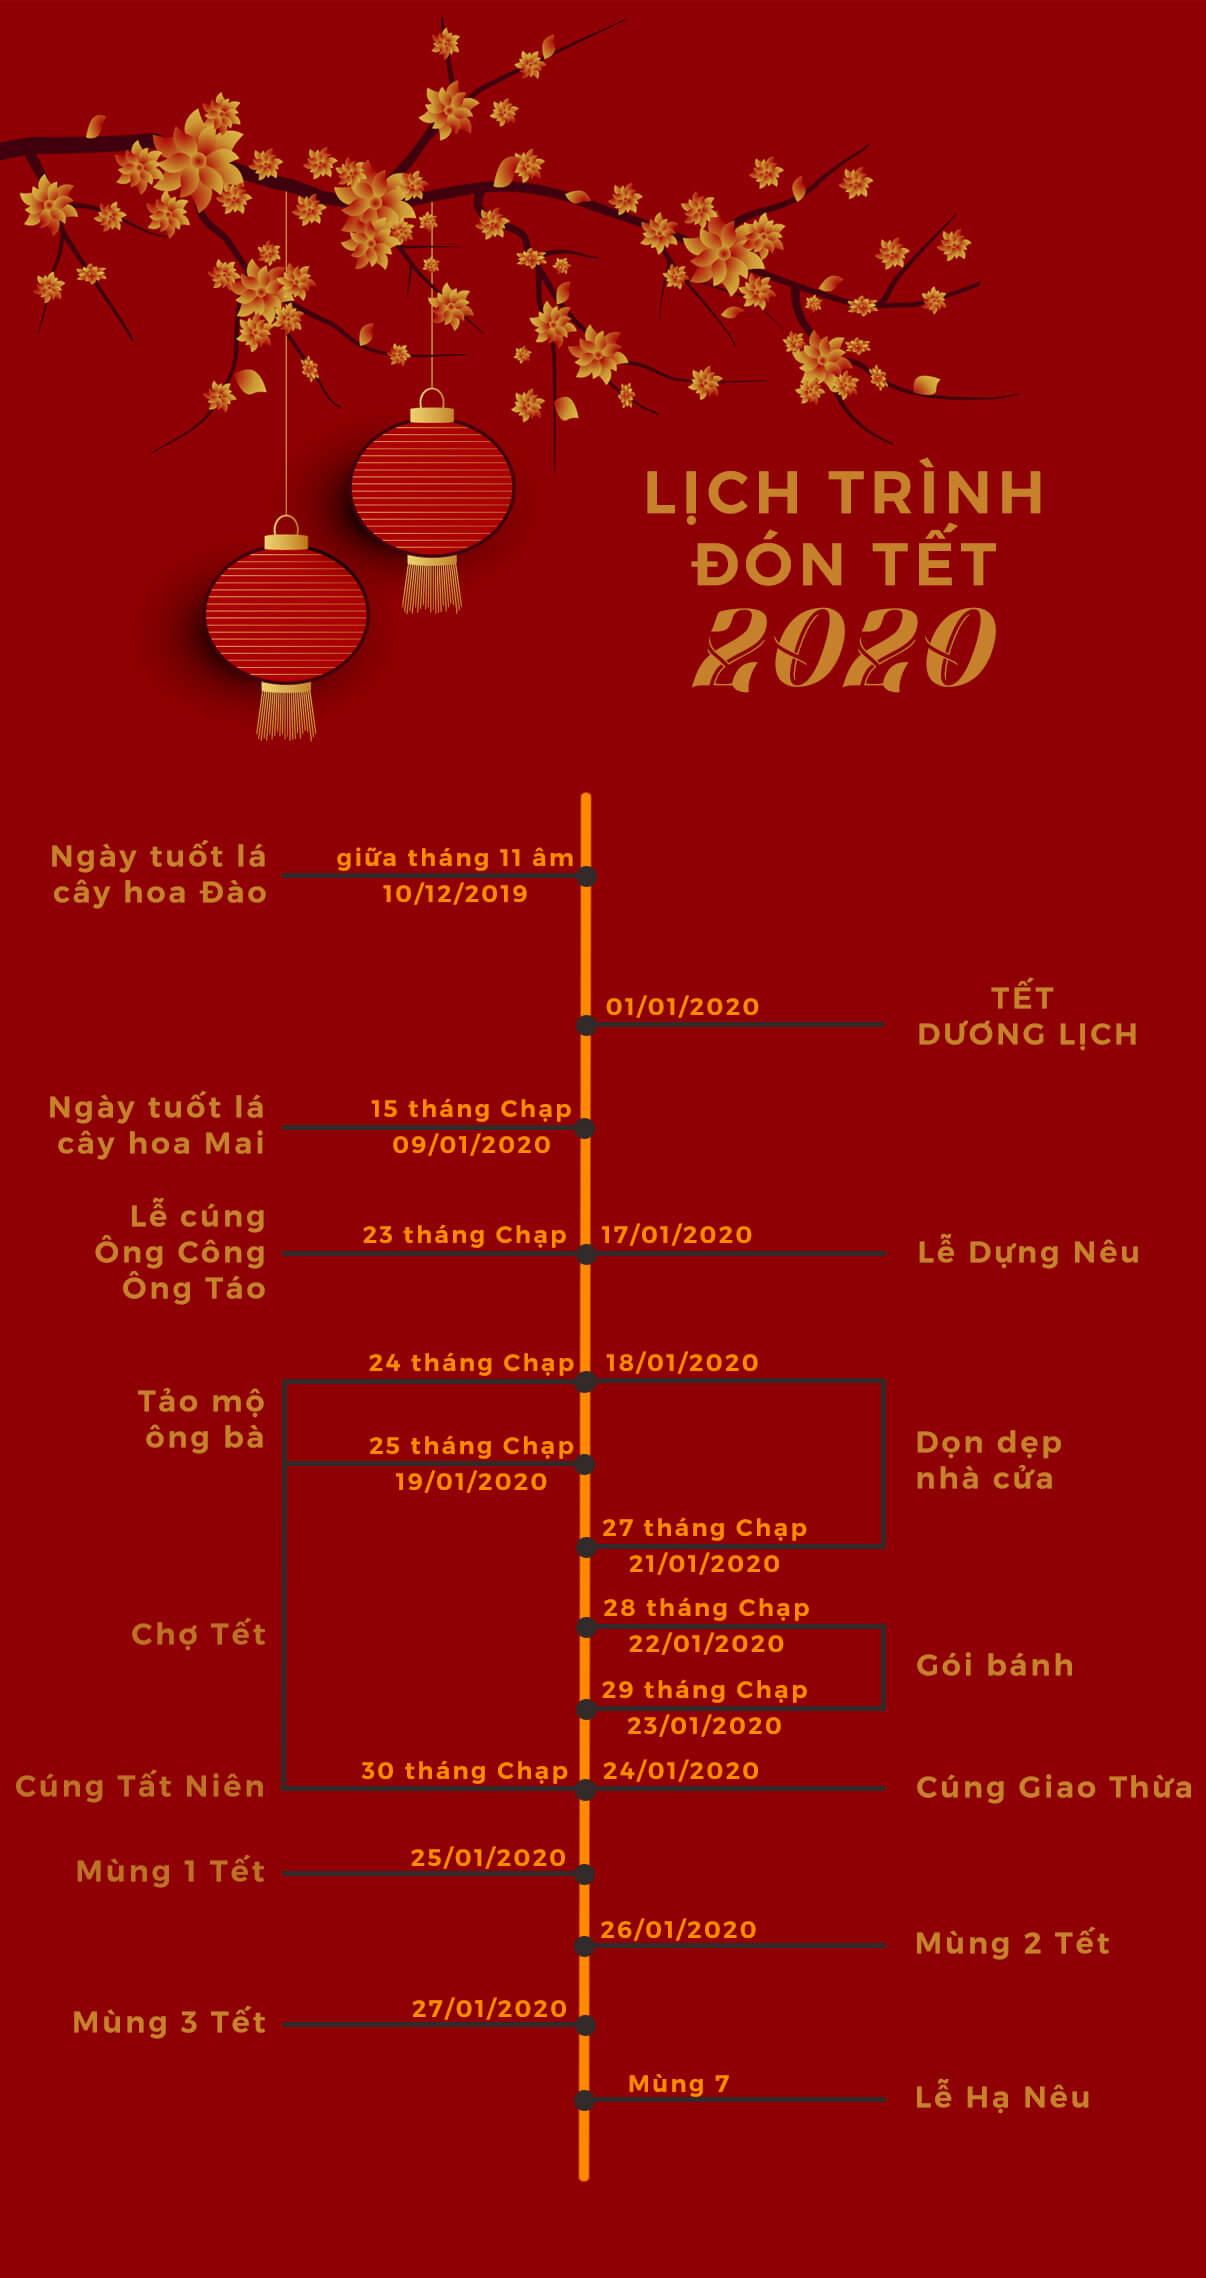 lich-trinh-don-tet-2020